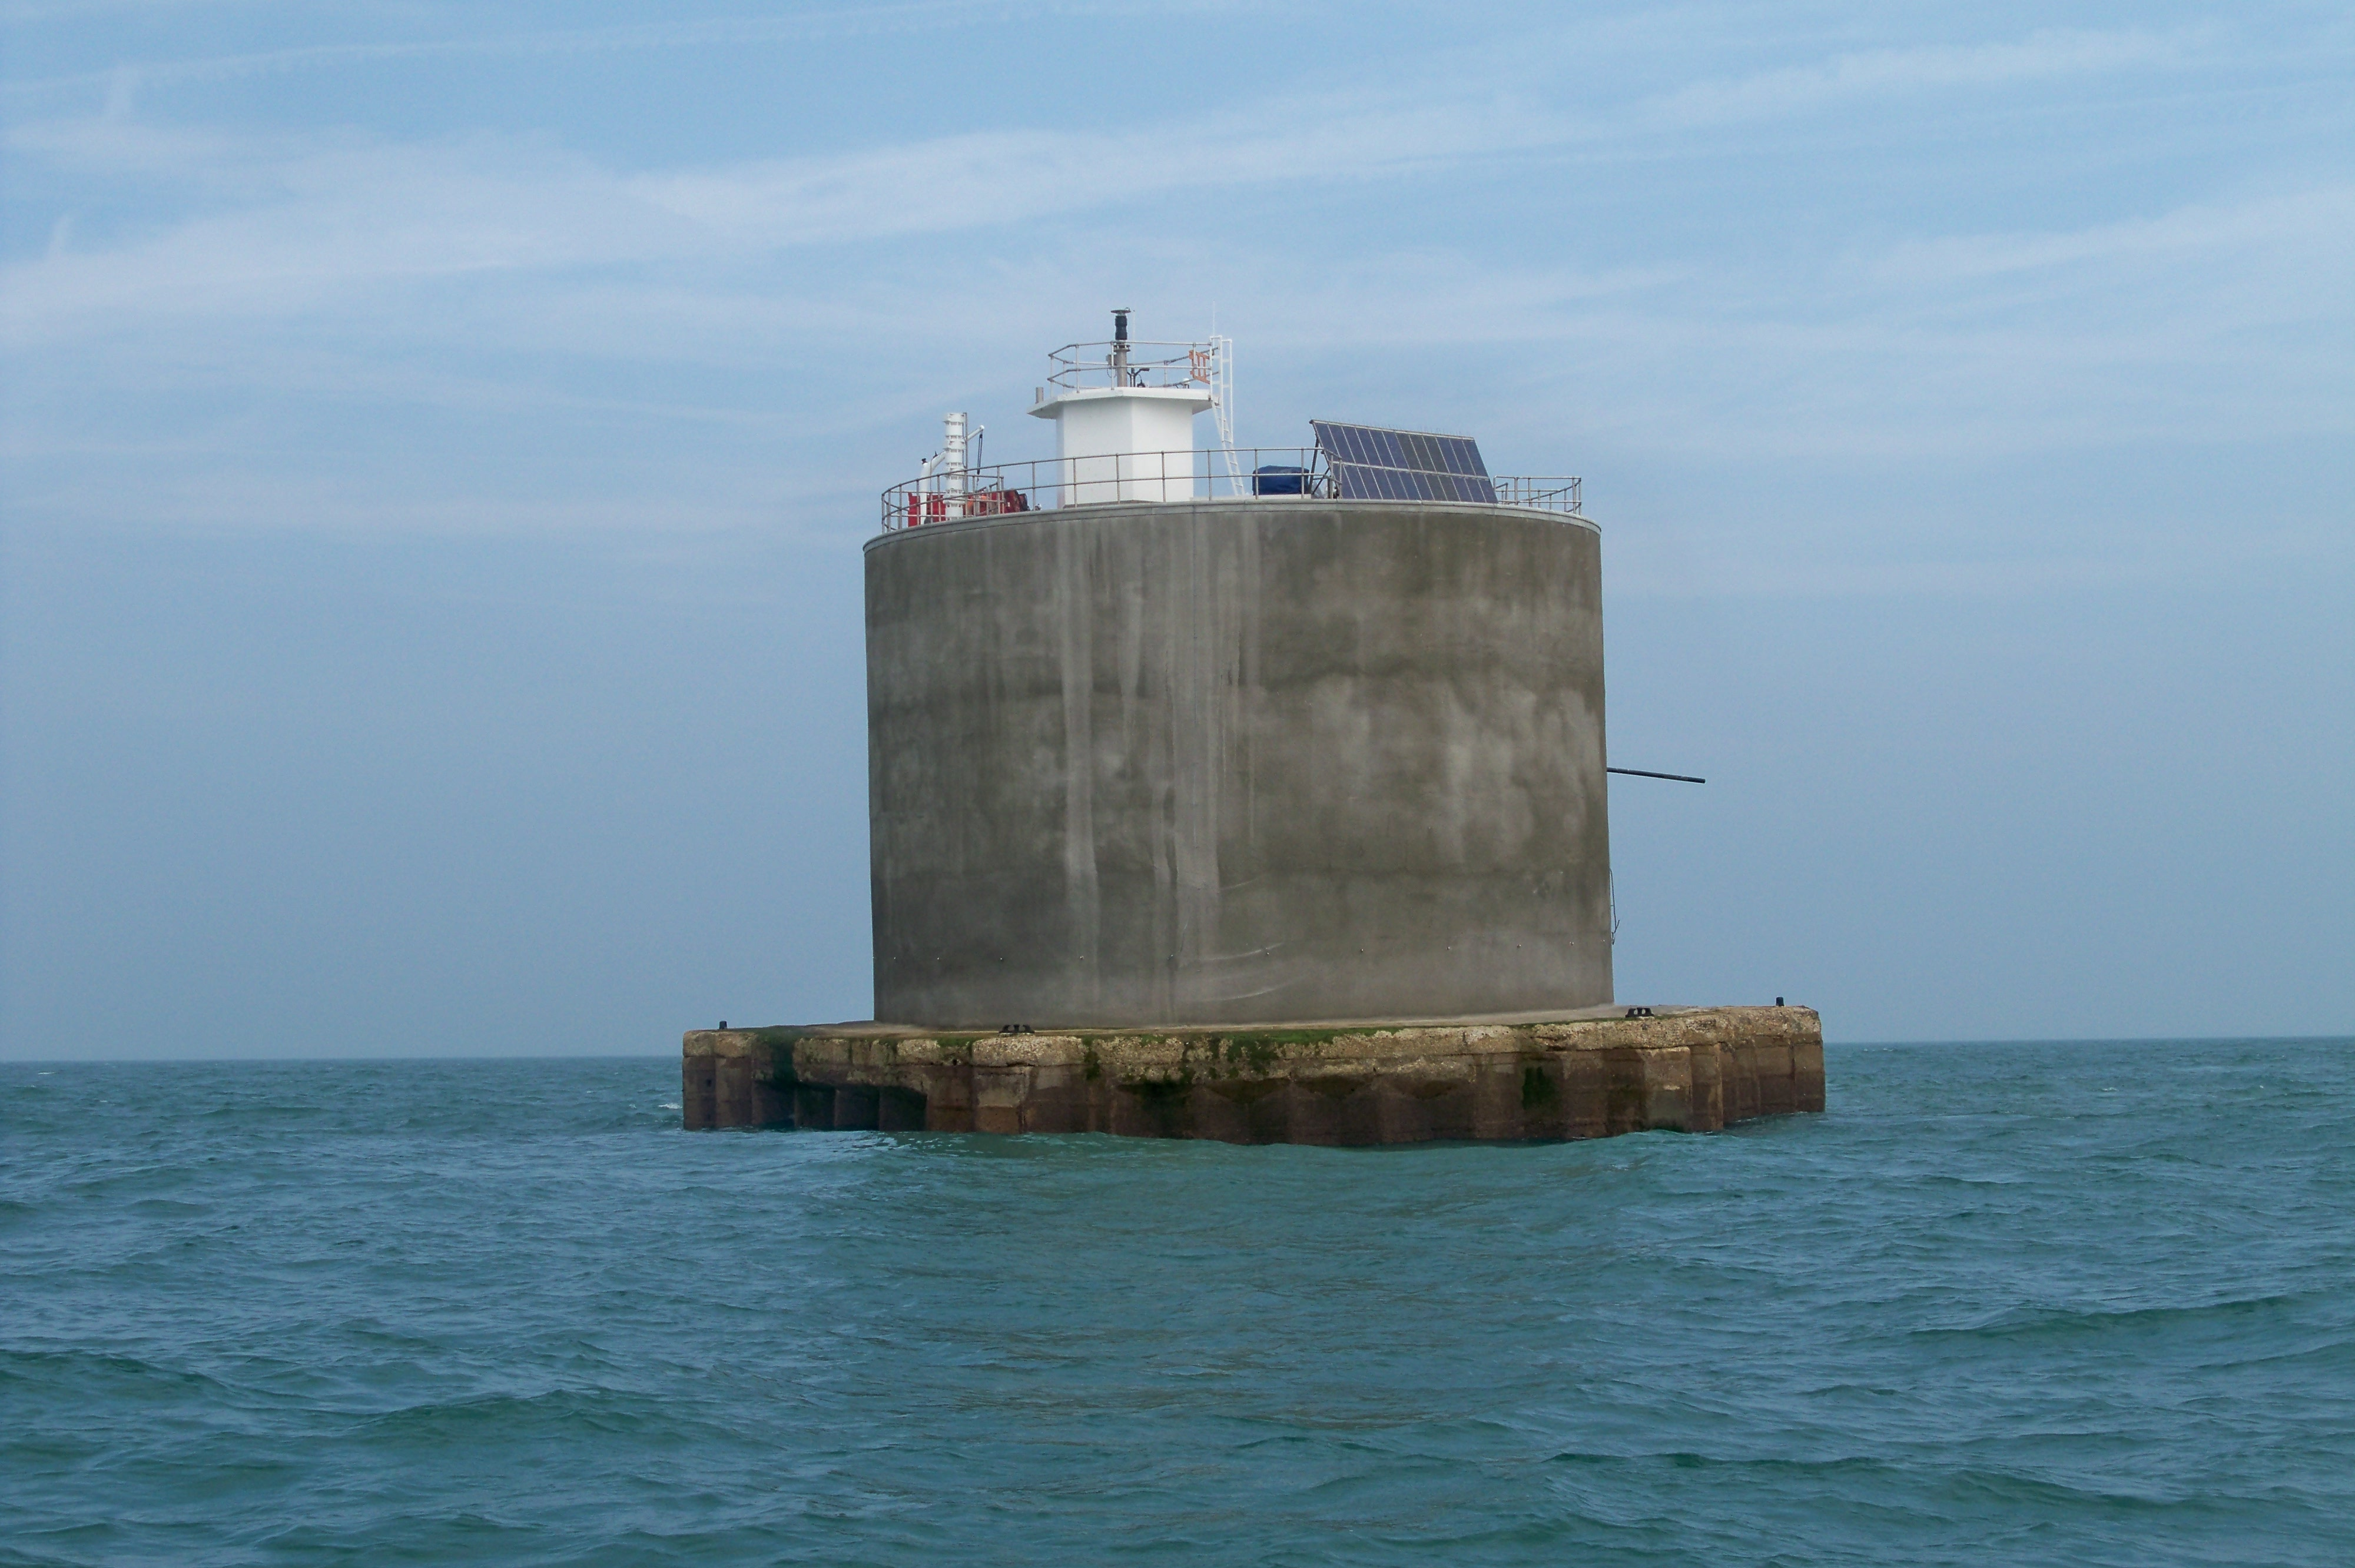 Nab Tower - Wikipedia